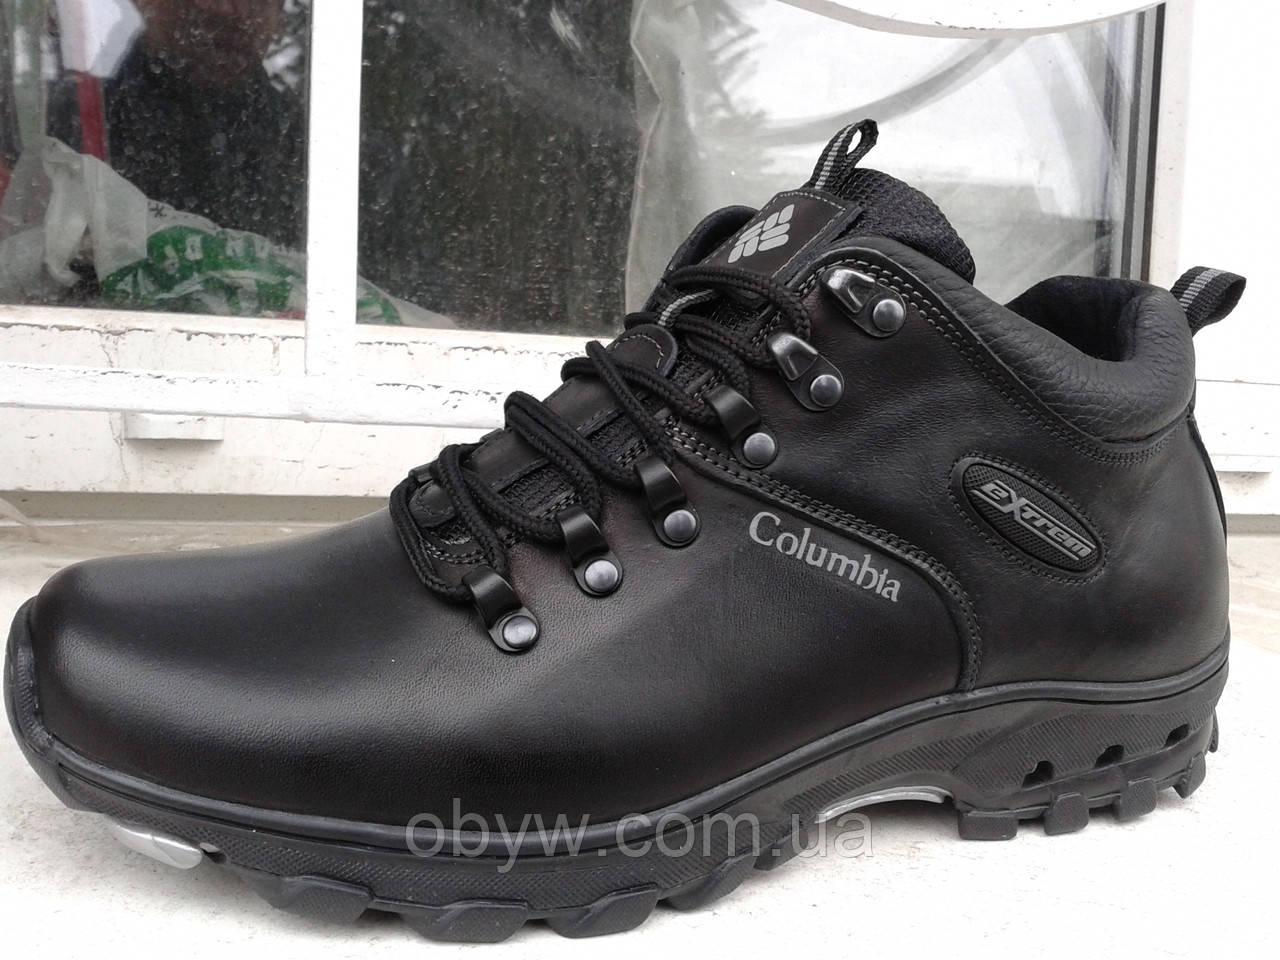 Зимние ботинки  Cаlambia т 34